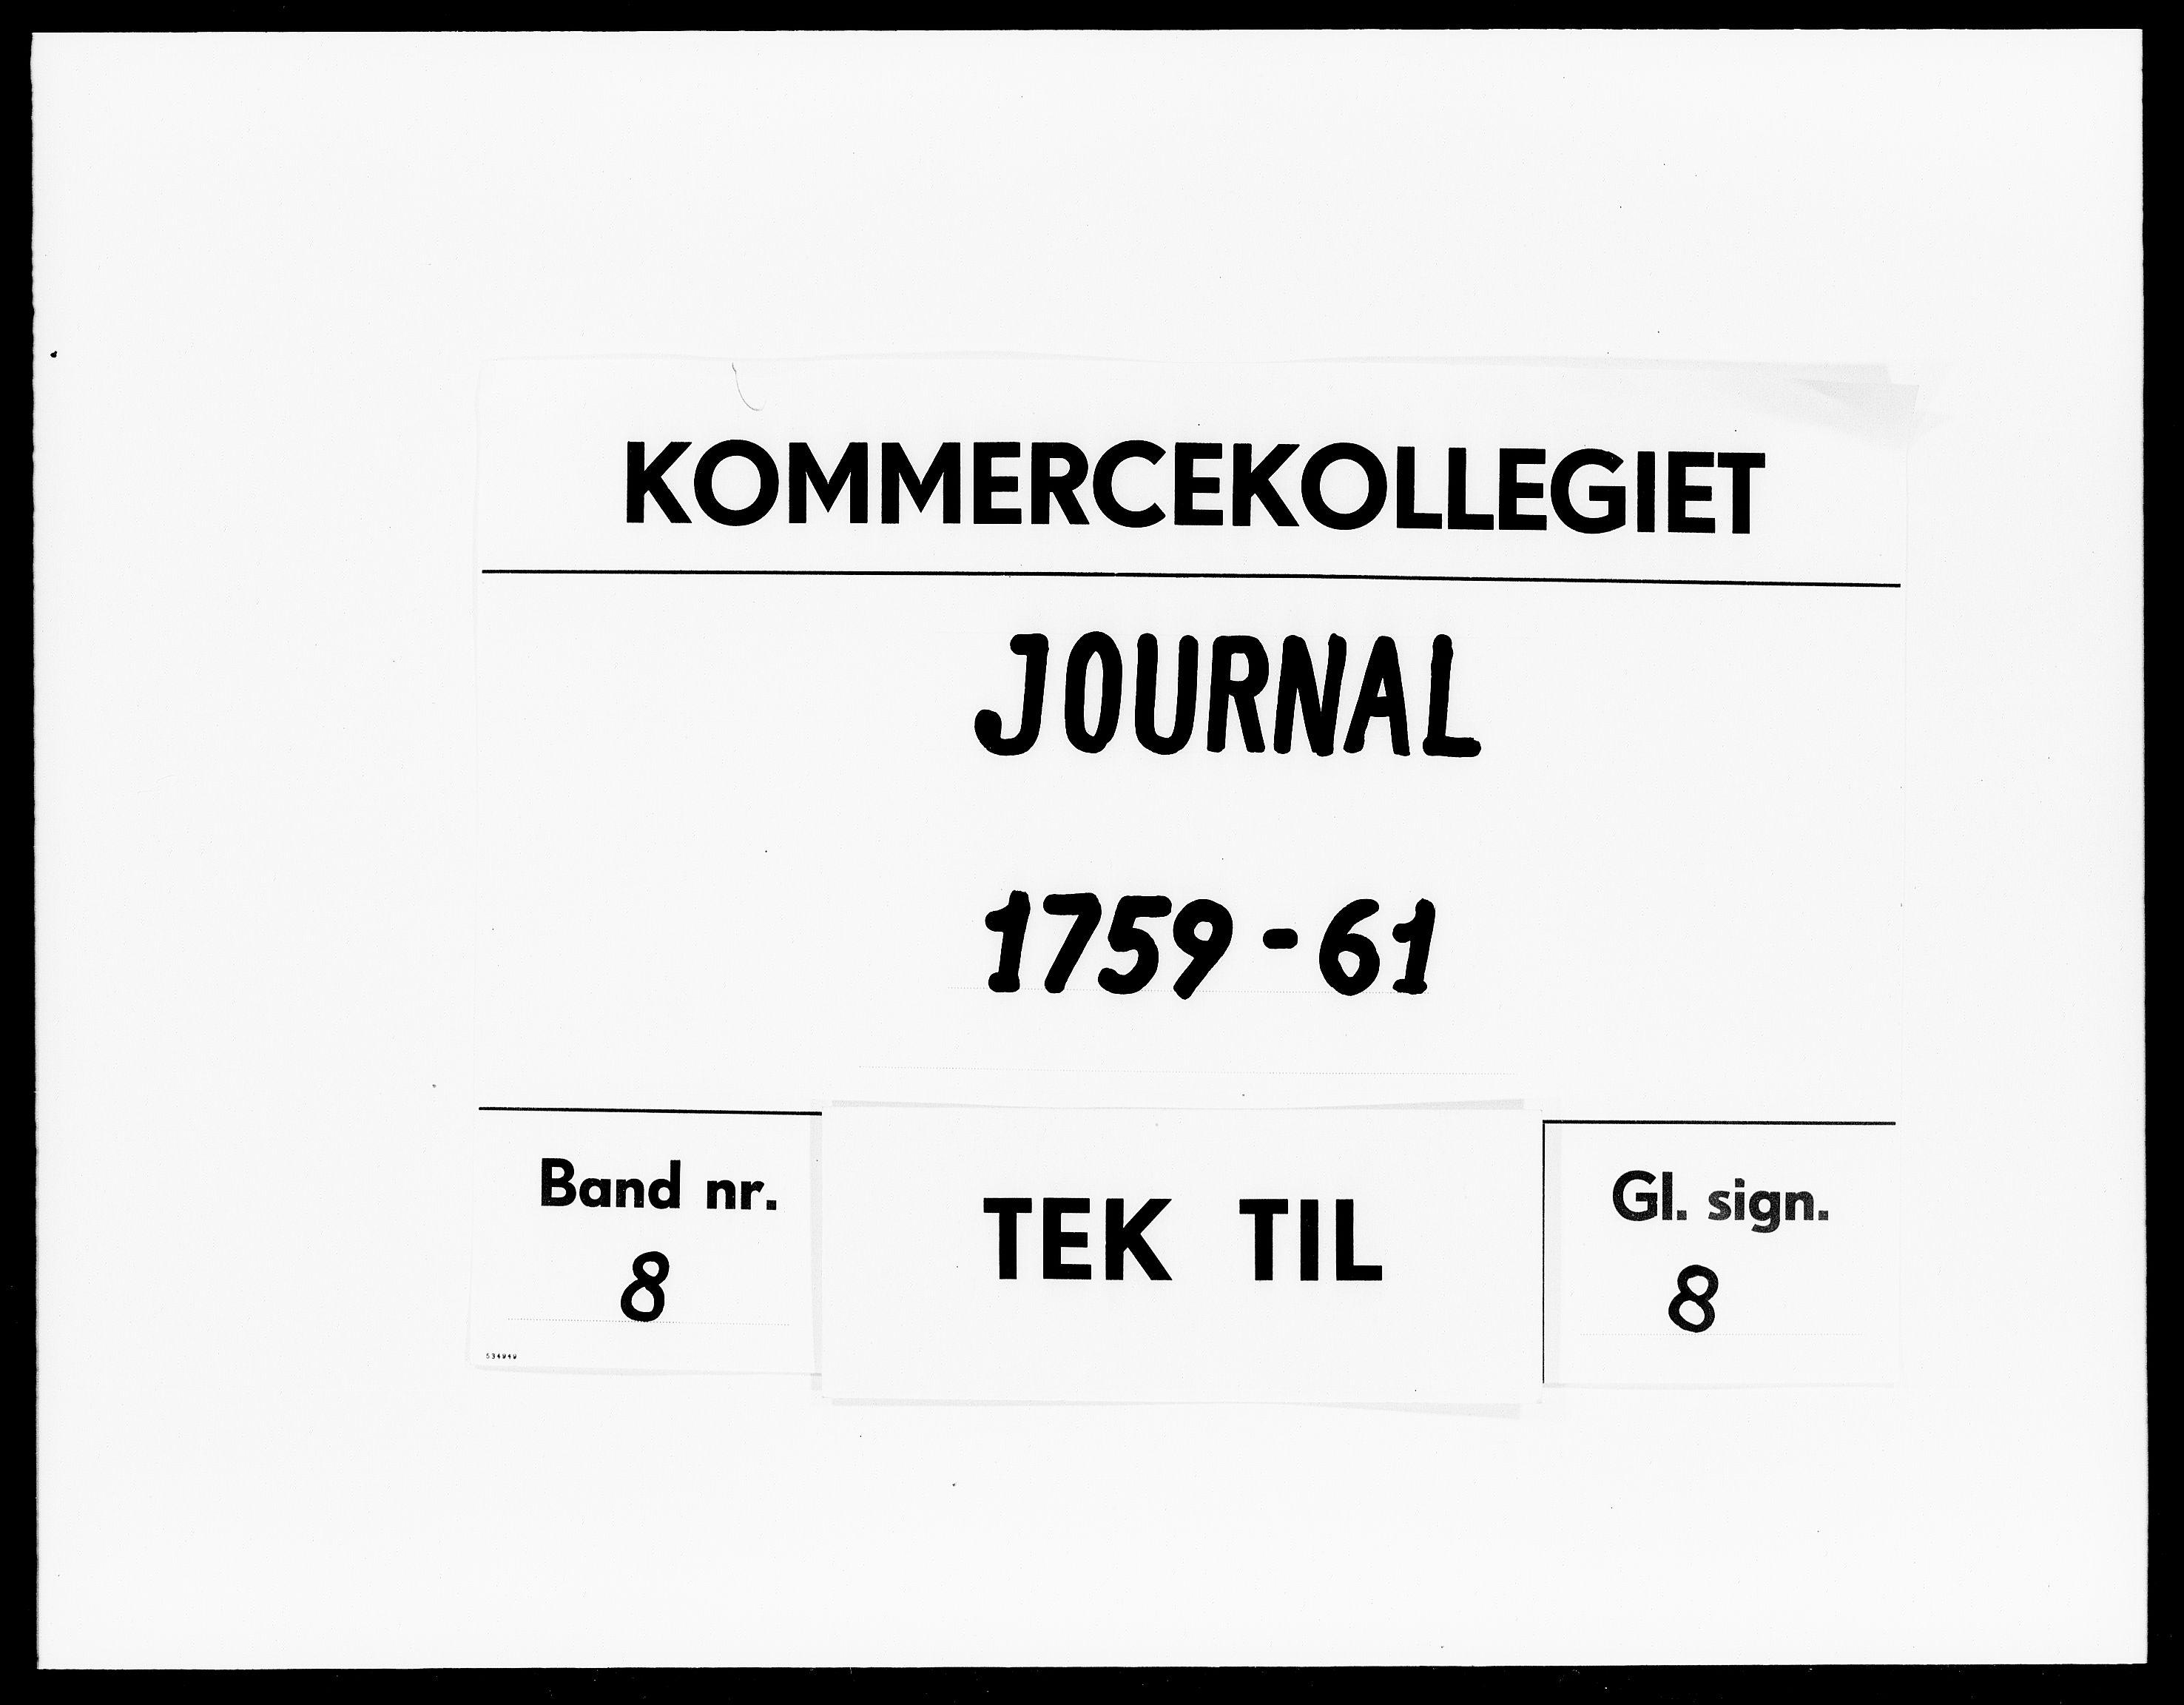 DRA, Kommercekollegiet, Dansk-Norske Sekretariat, -/56: Journal nr. 8, 1759-1761